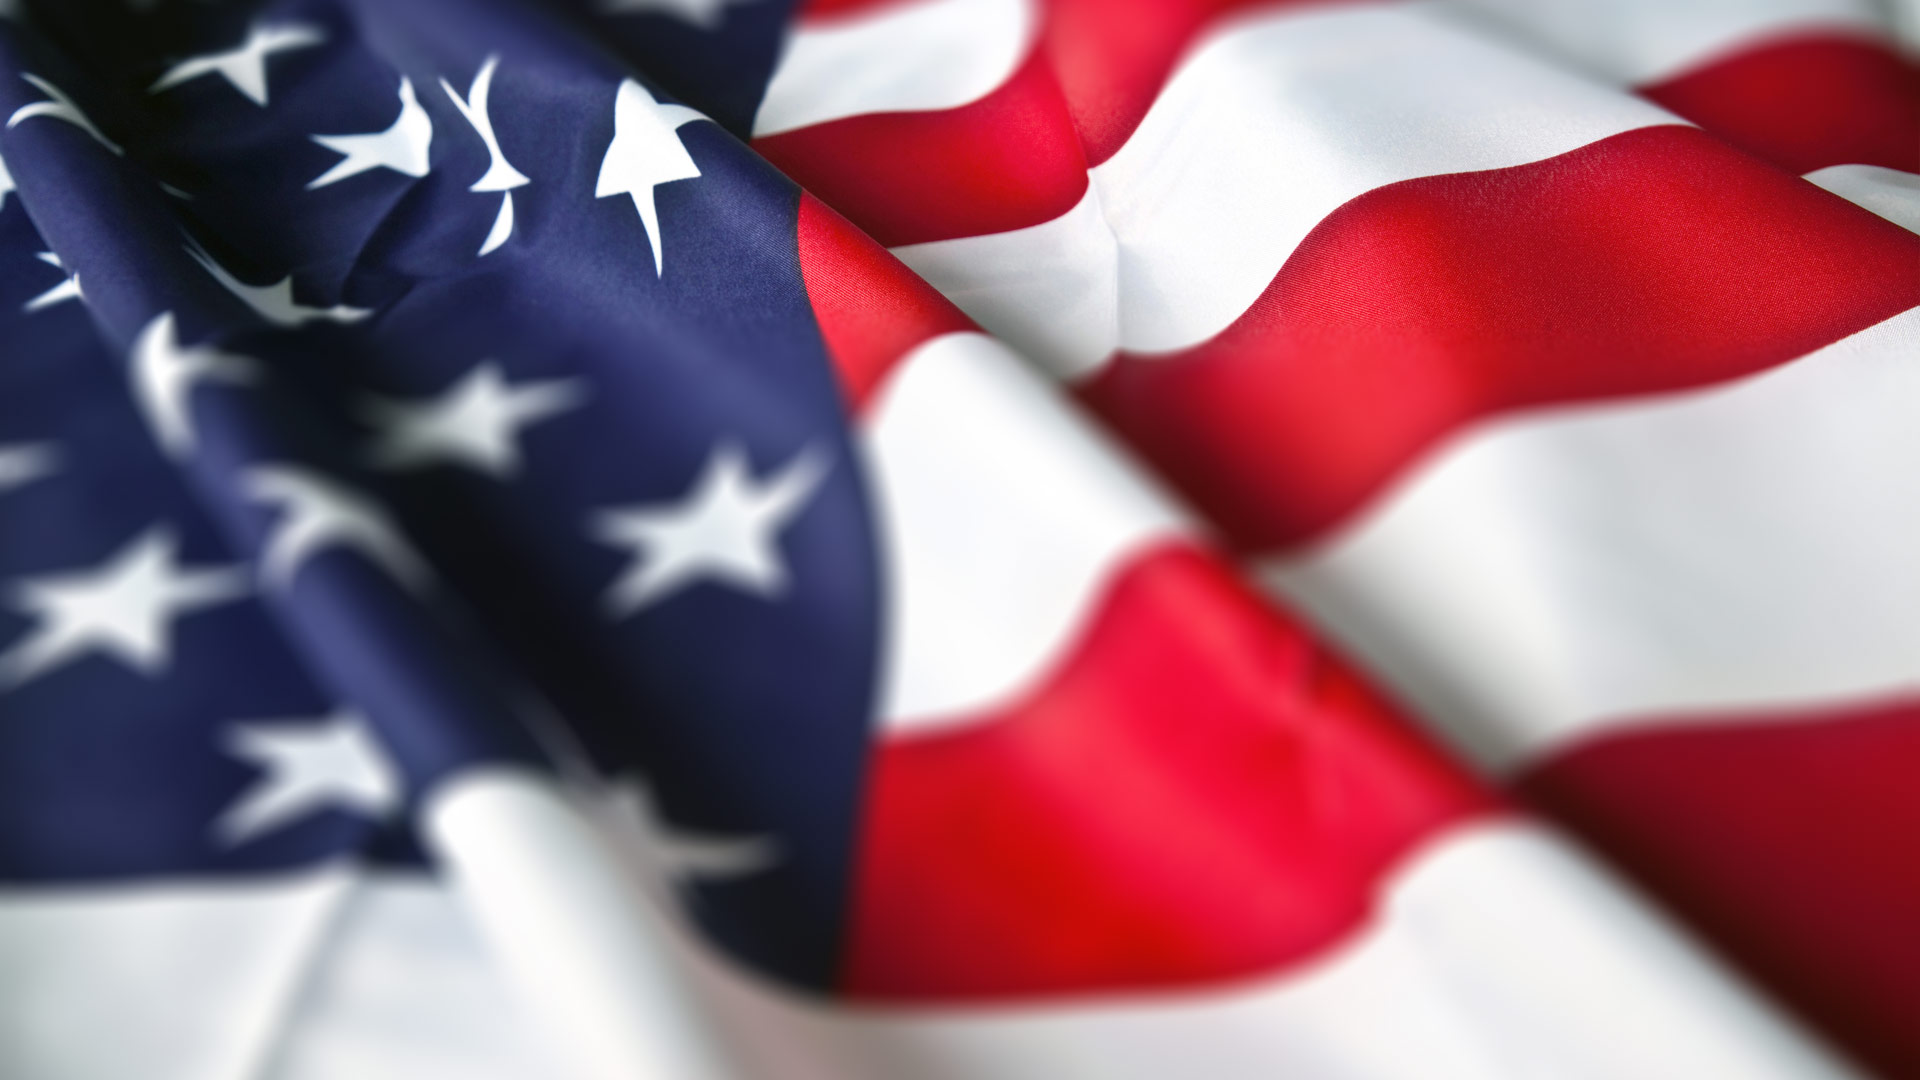 Disabled American Veteran Dav Wichita Ks